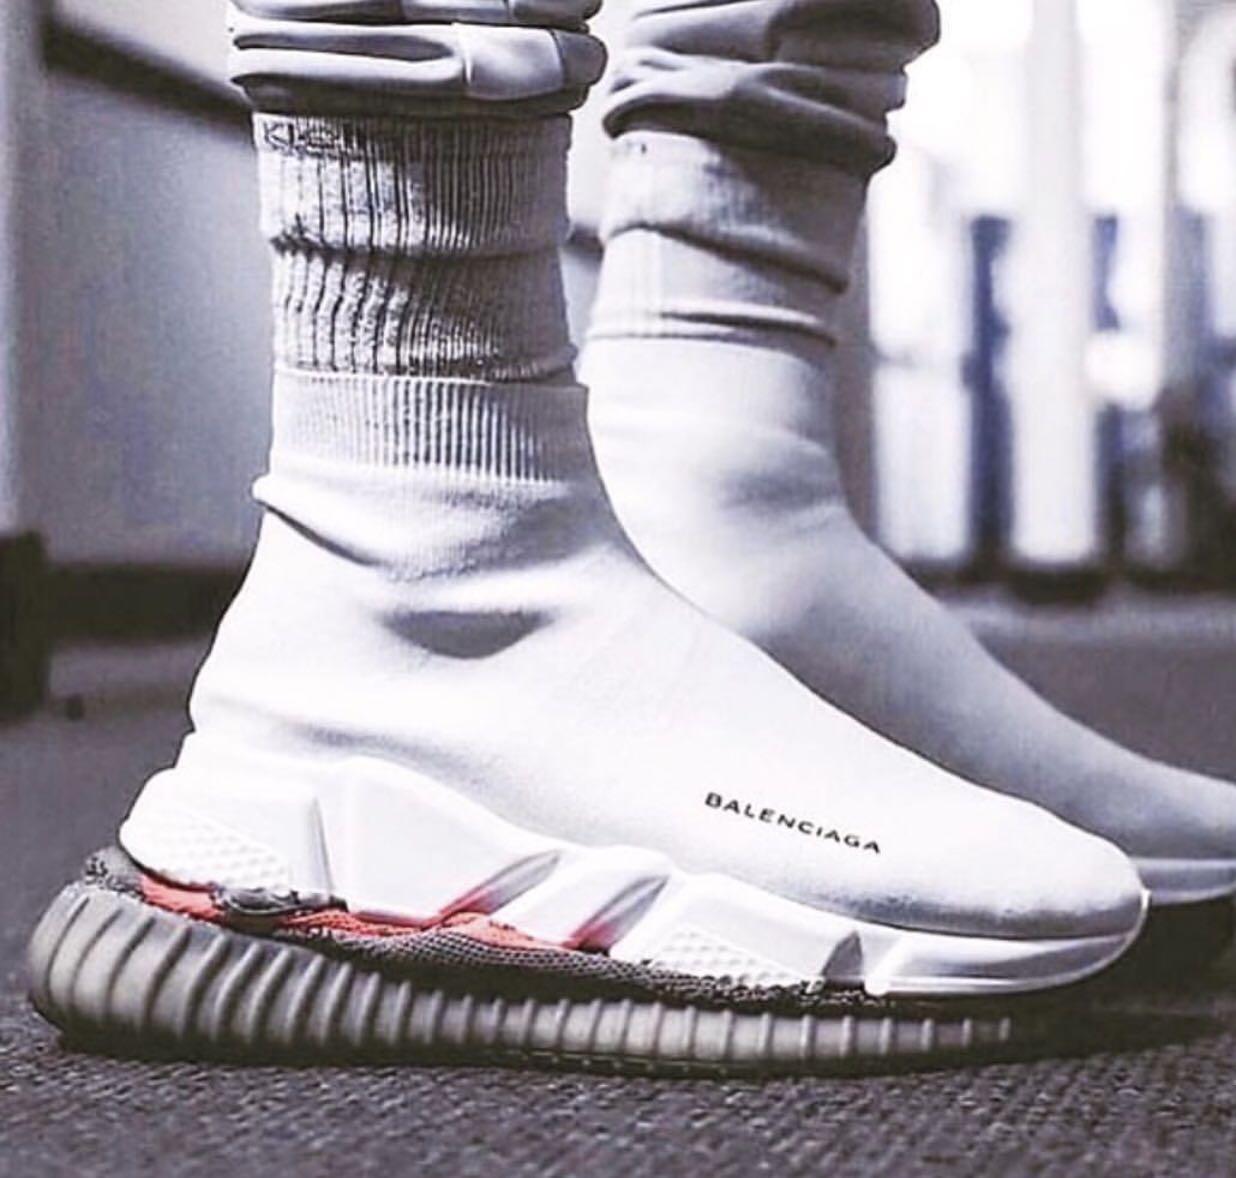 b22b90823d BN] Balenciaga Speed Trainers Triple White Sock Sneakers, Men's ...